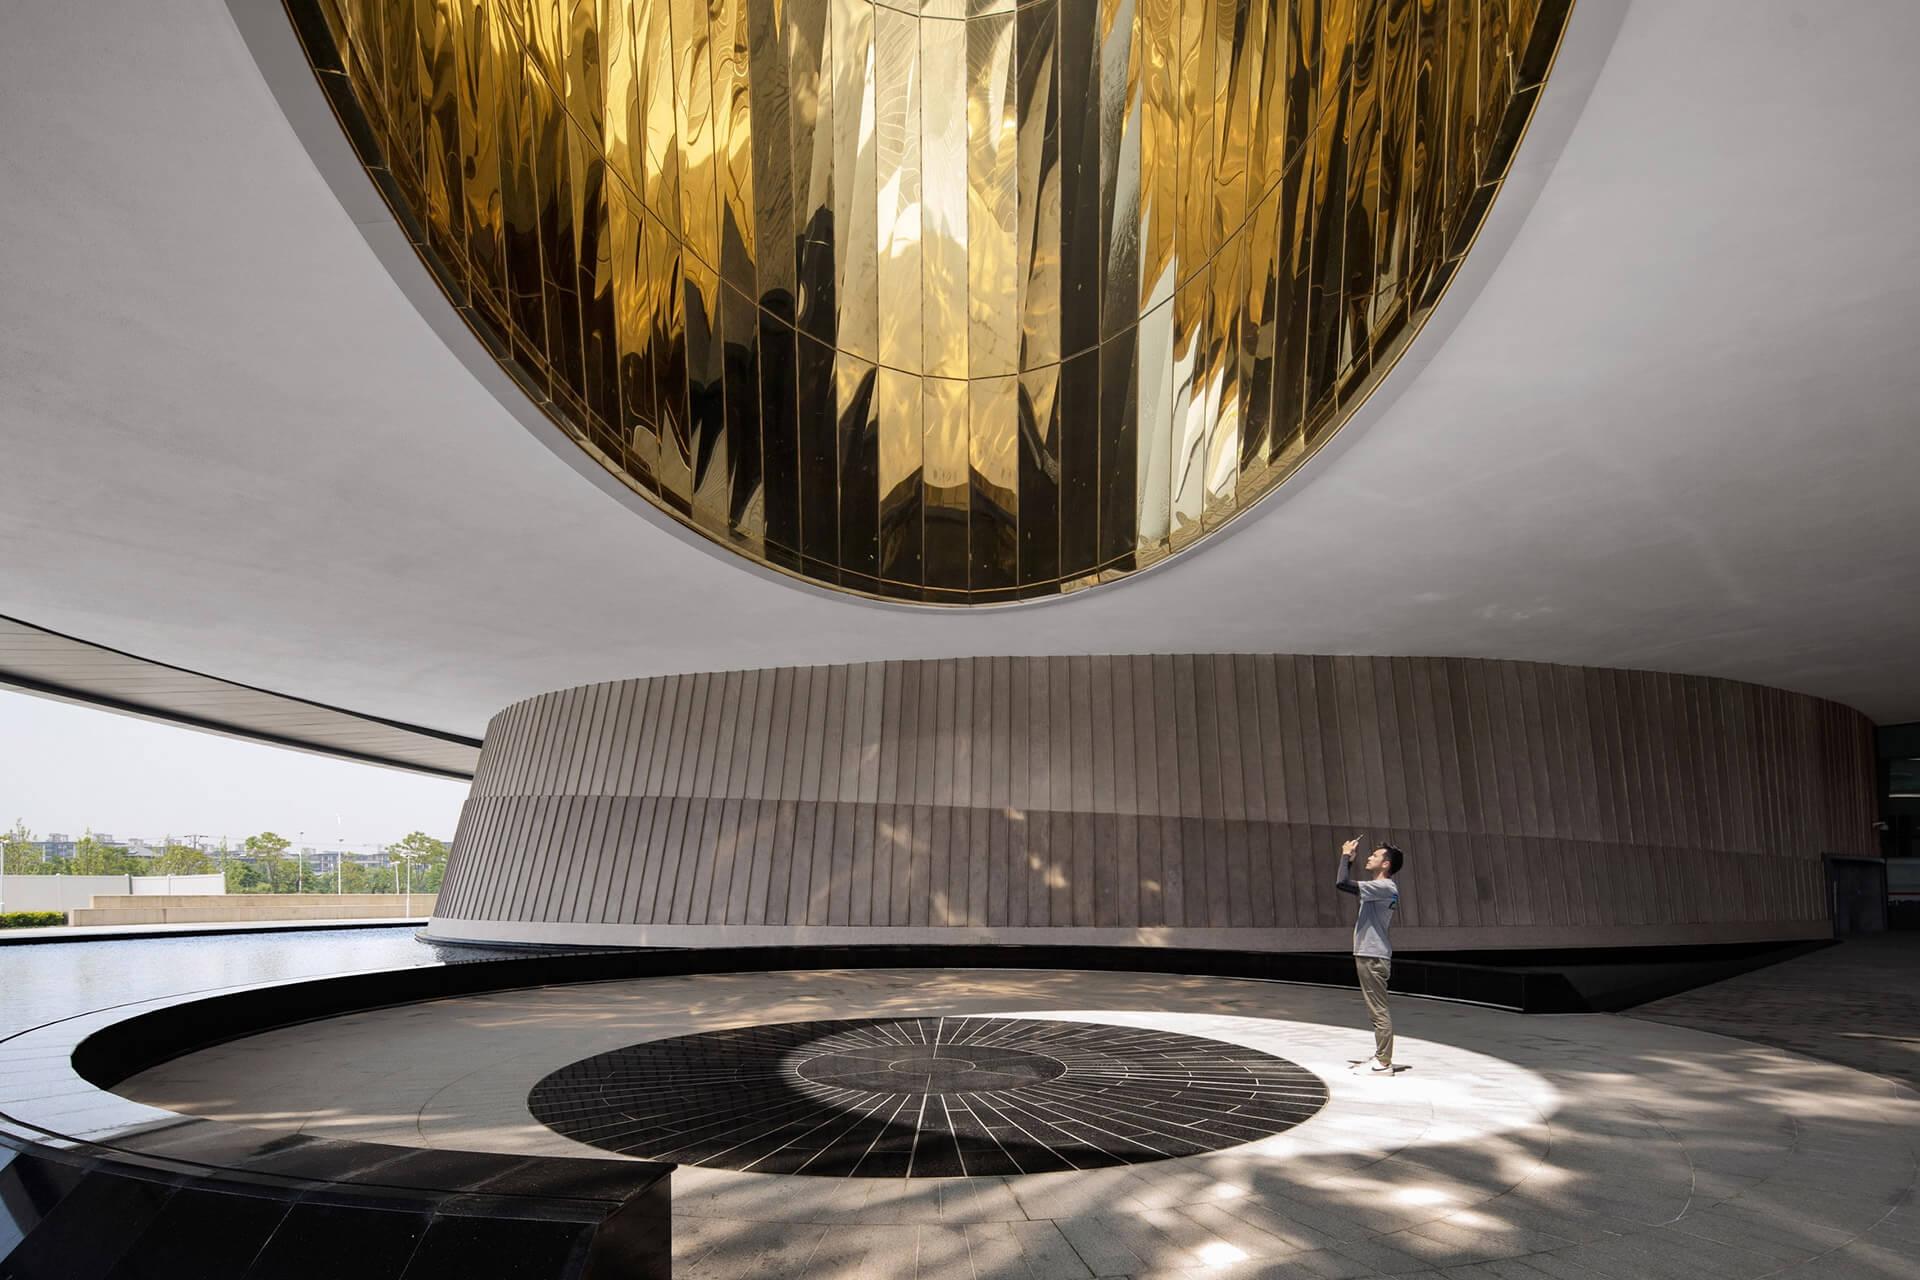 shanghai astronomy museum 6